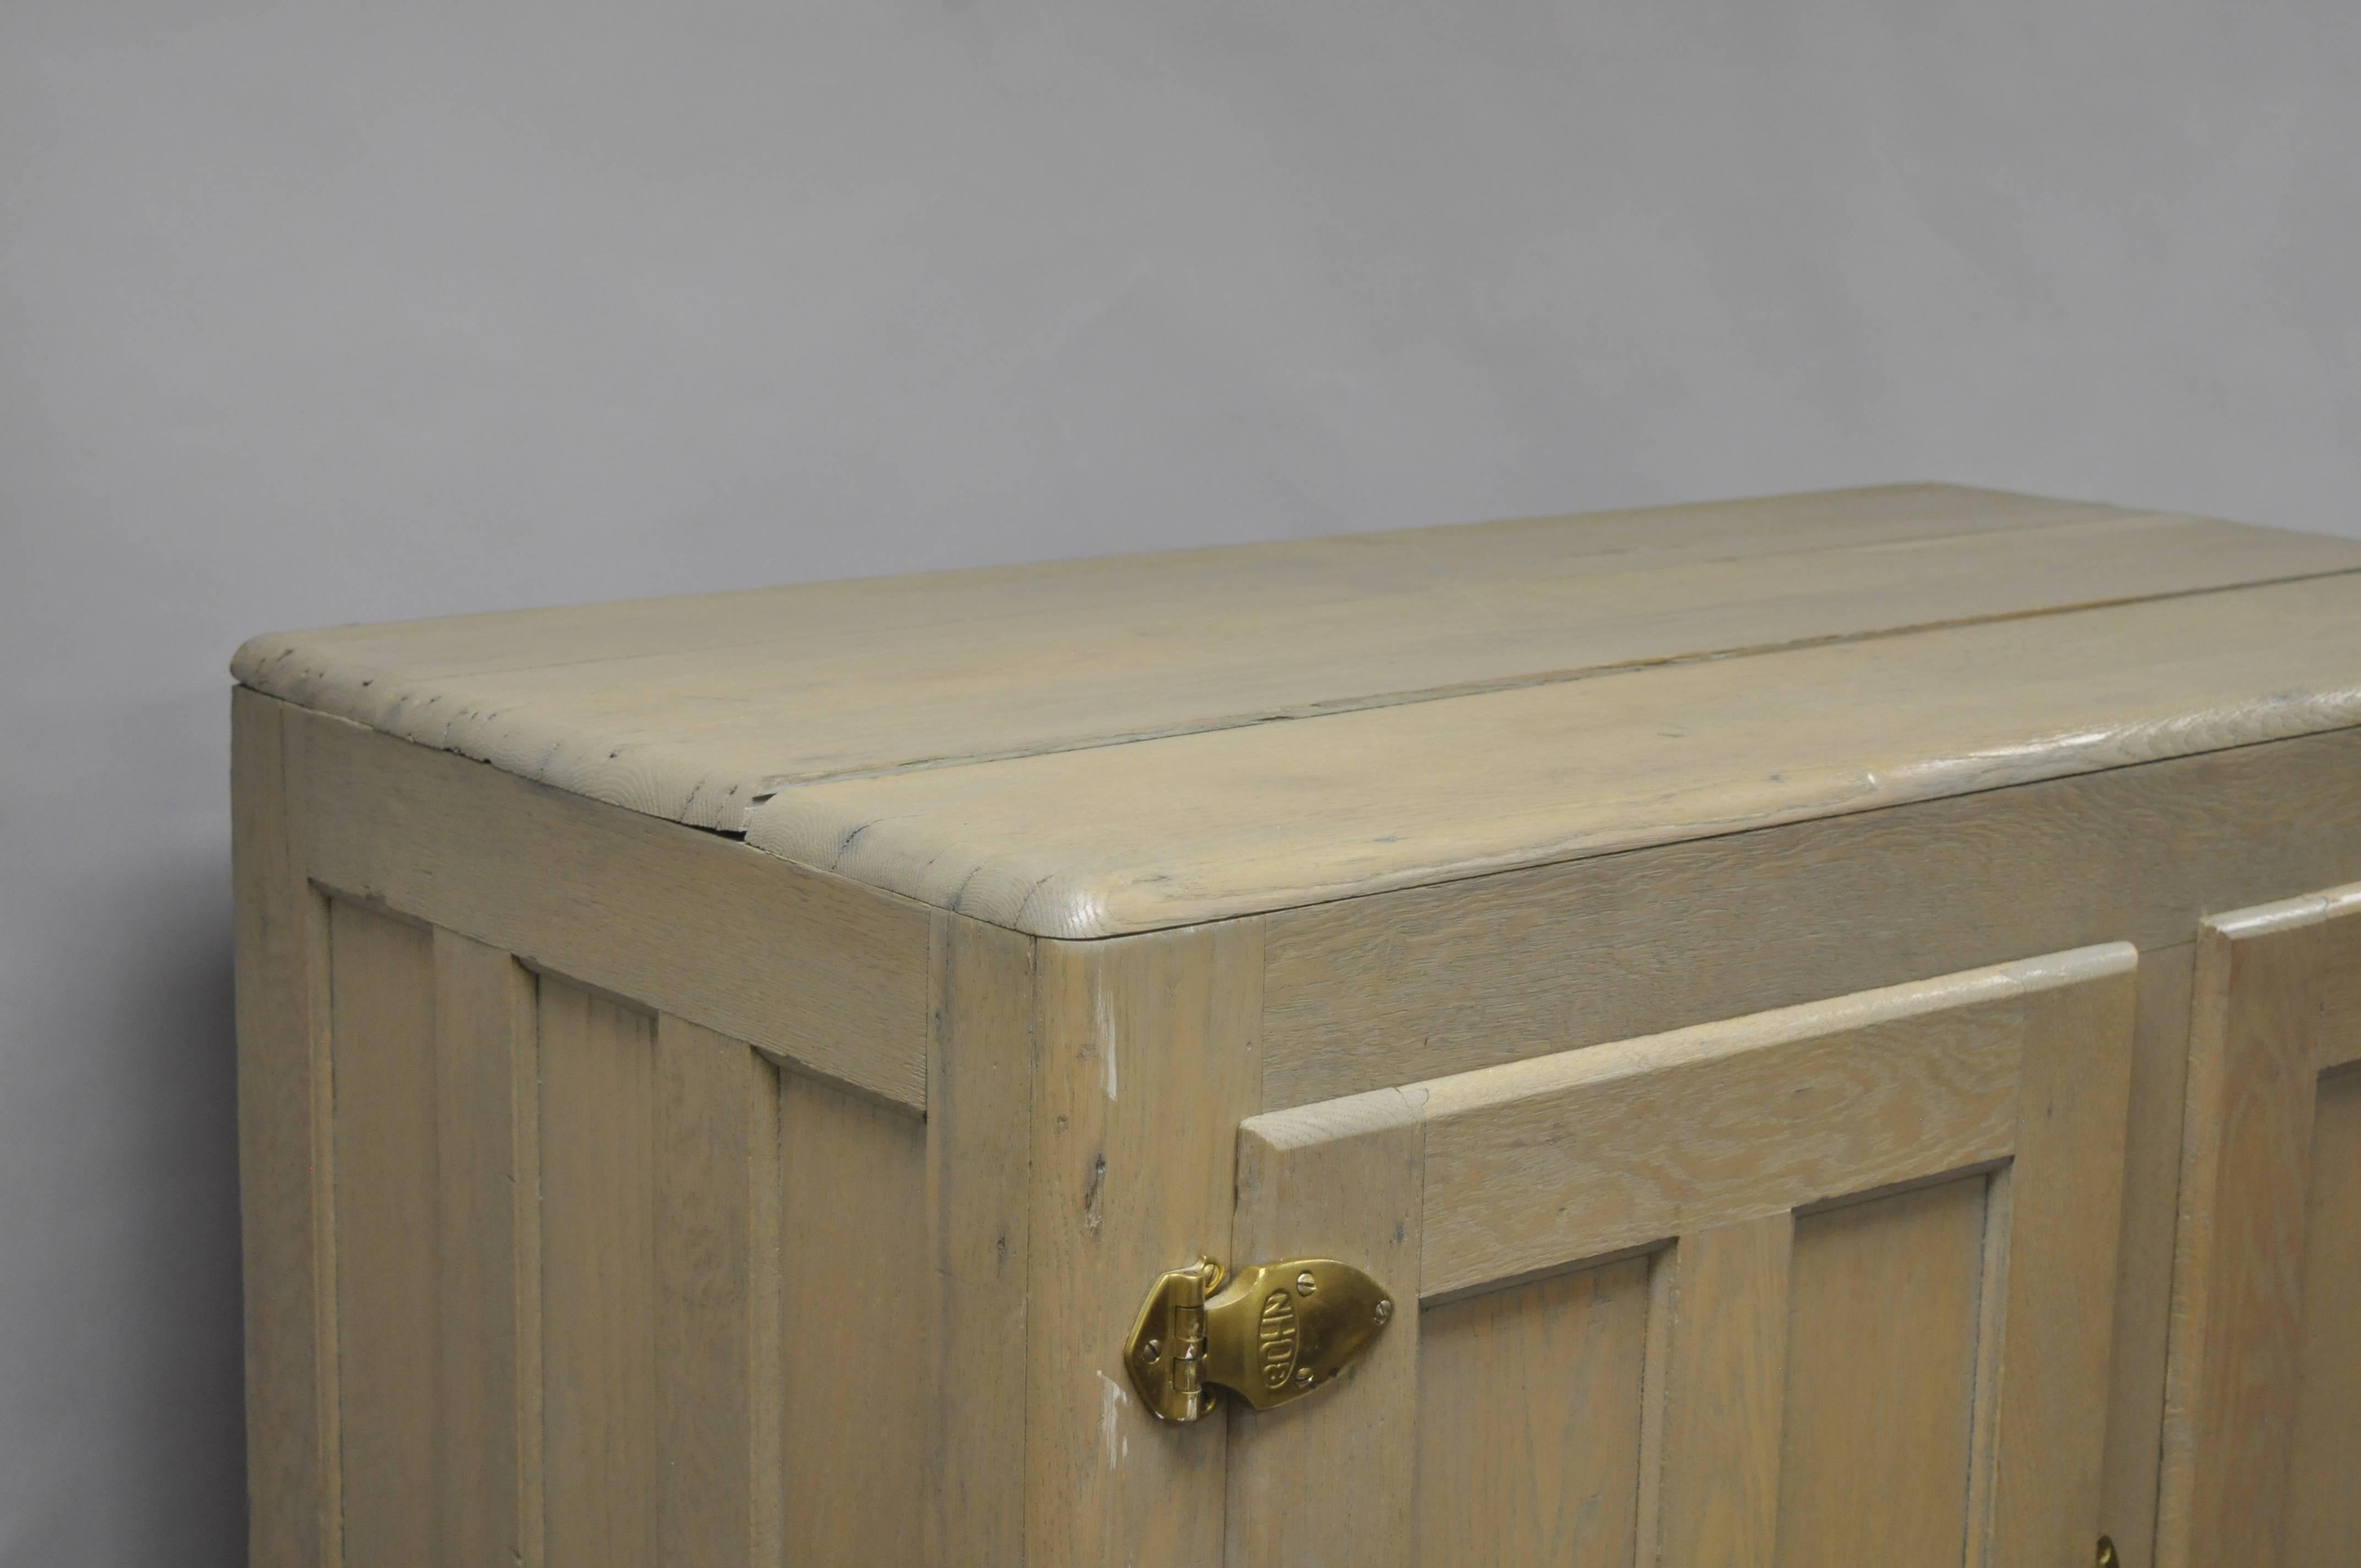 Large Bohn Syphon Refrigerator Five Door Oak Wood Icebox